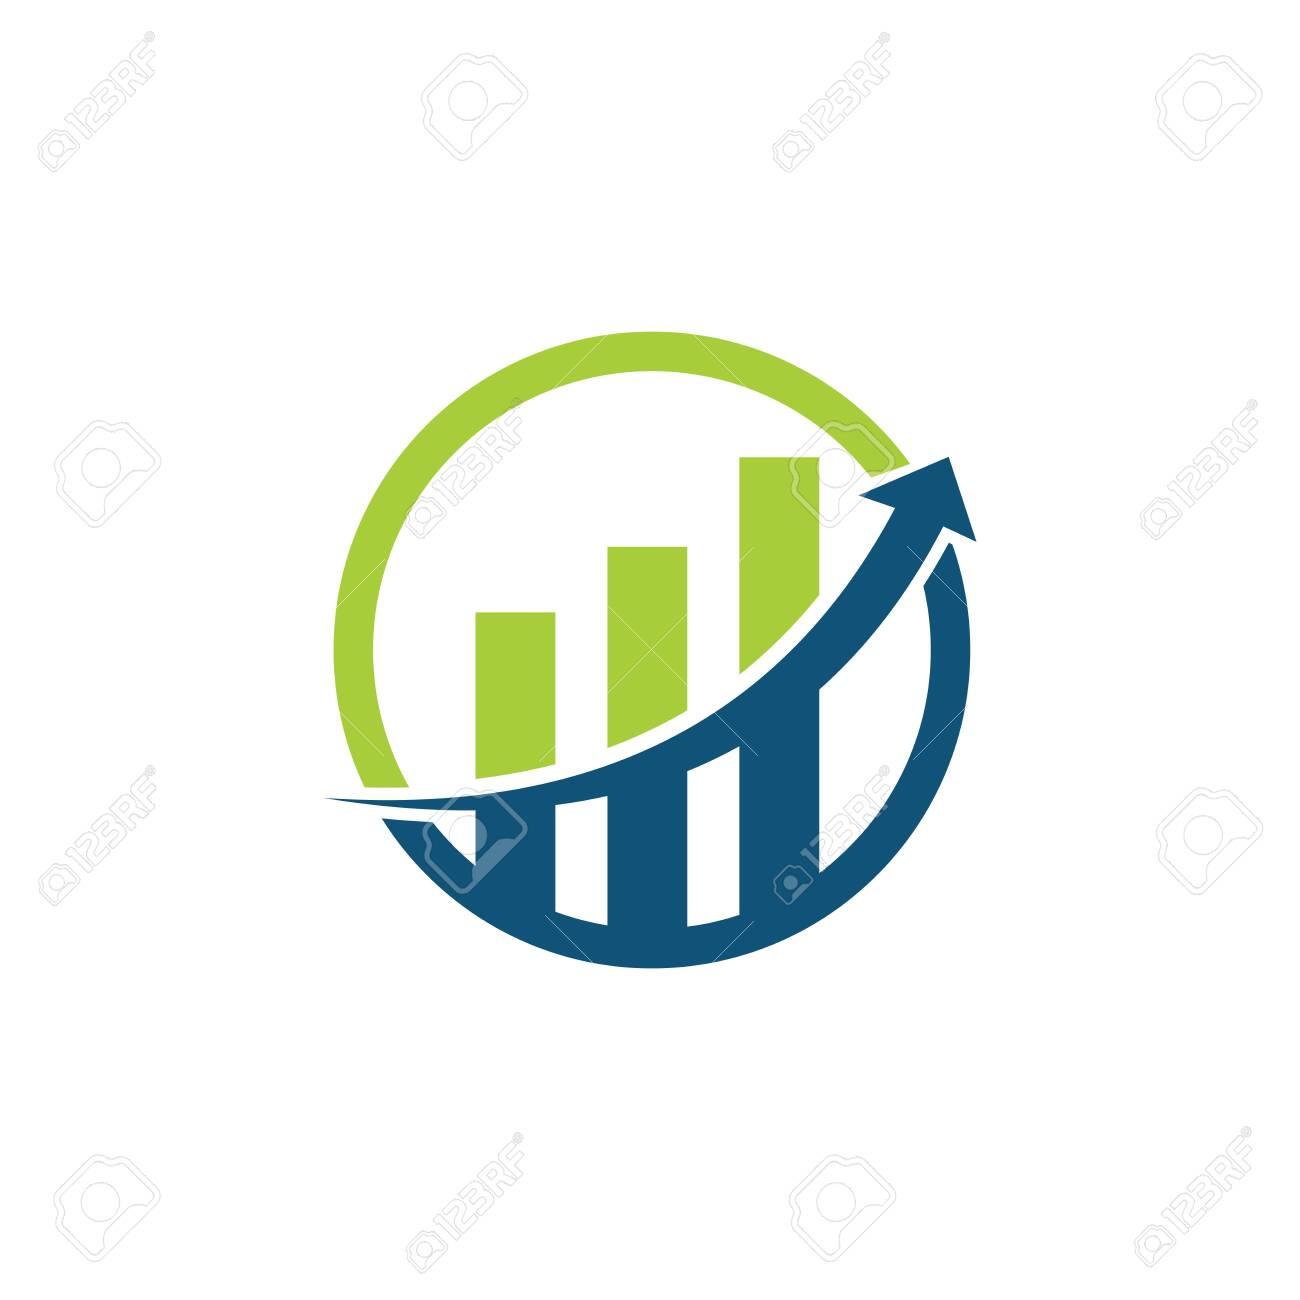 Business Finance professional logo template vector - 139483859